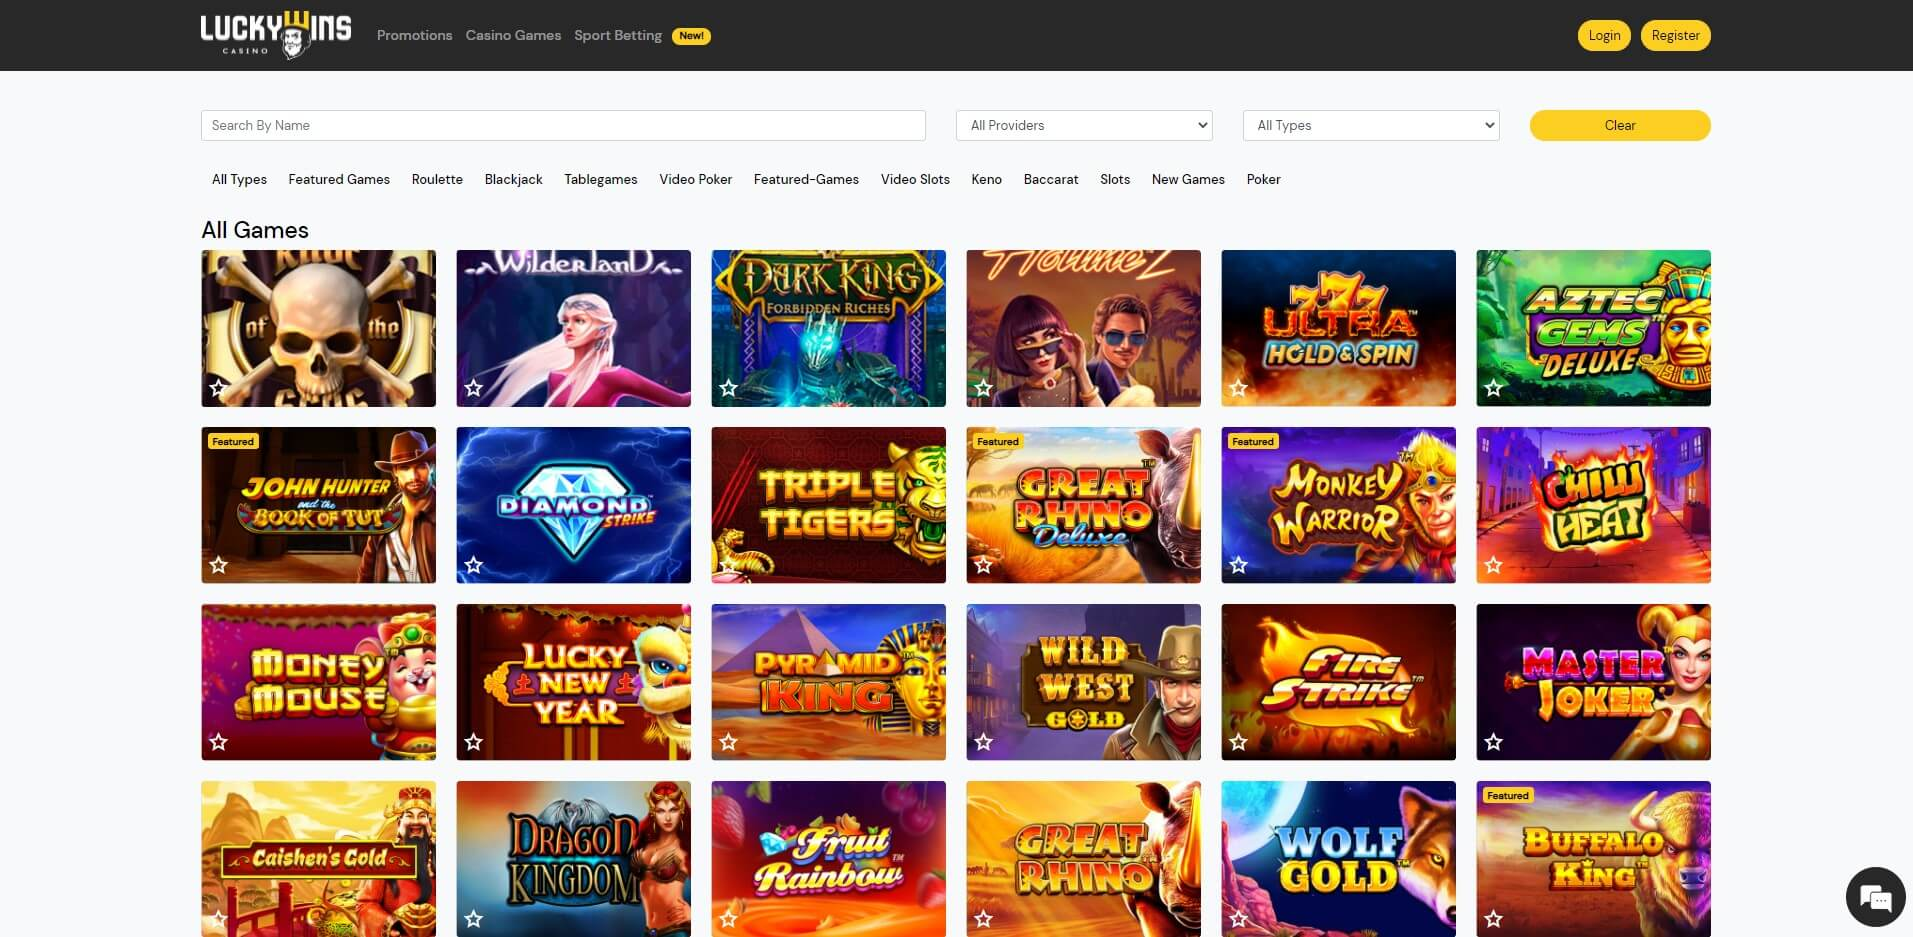 Games at LuckyWins Casino